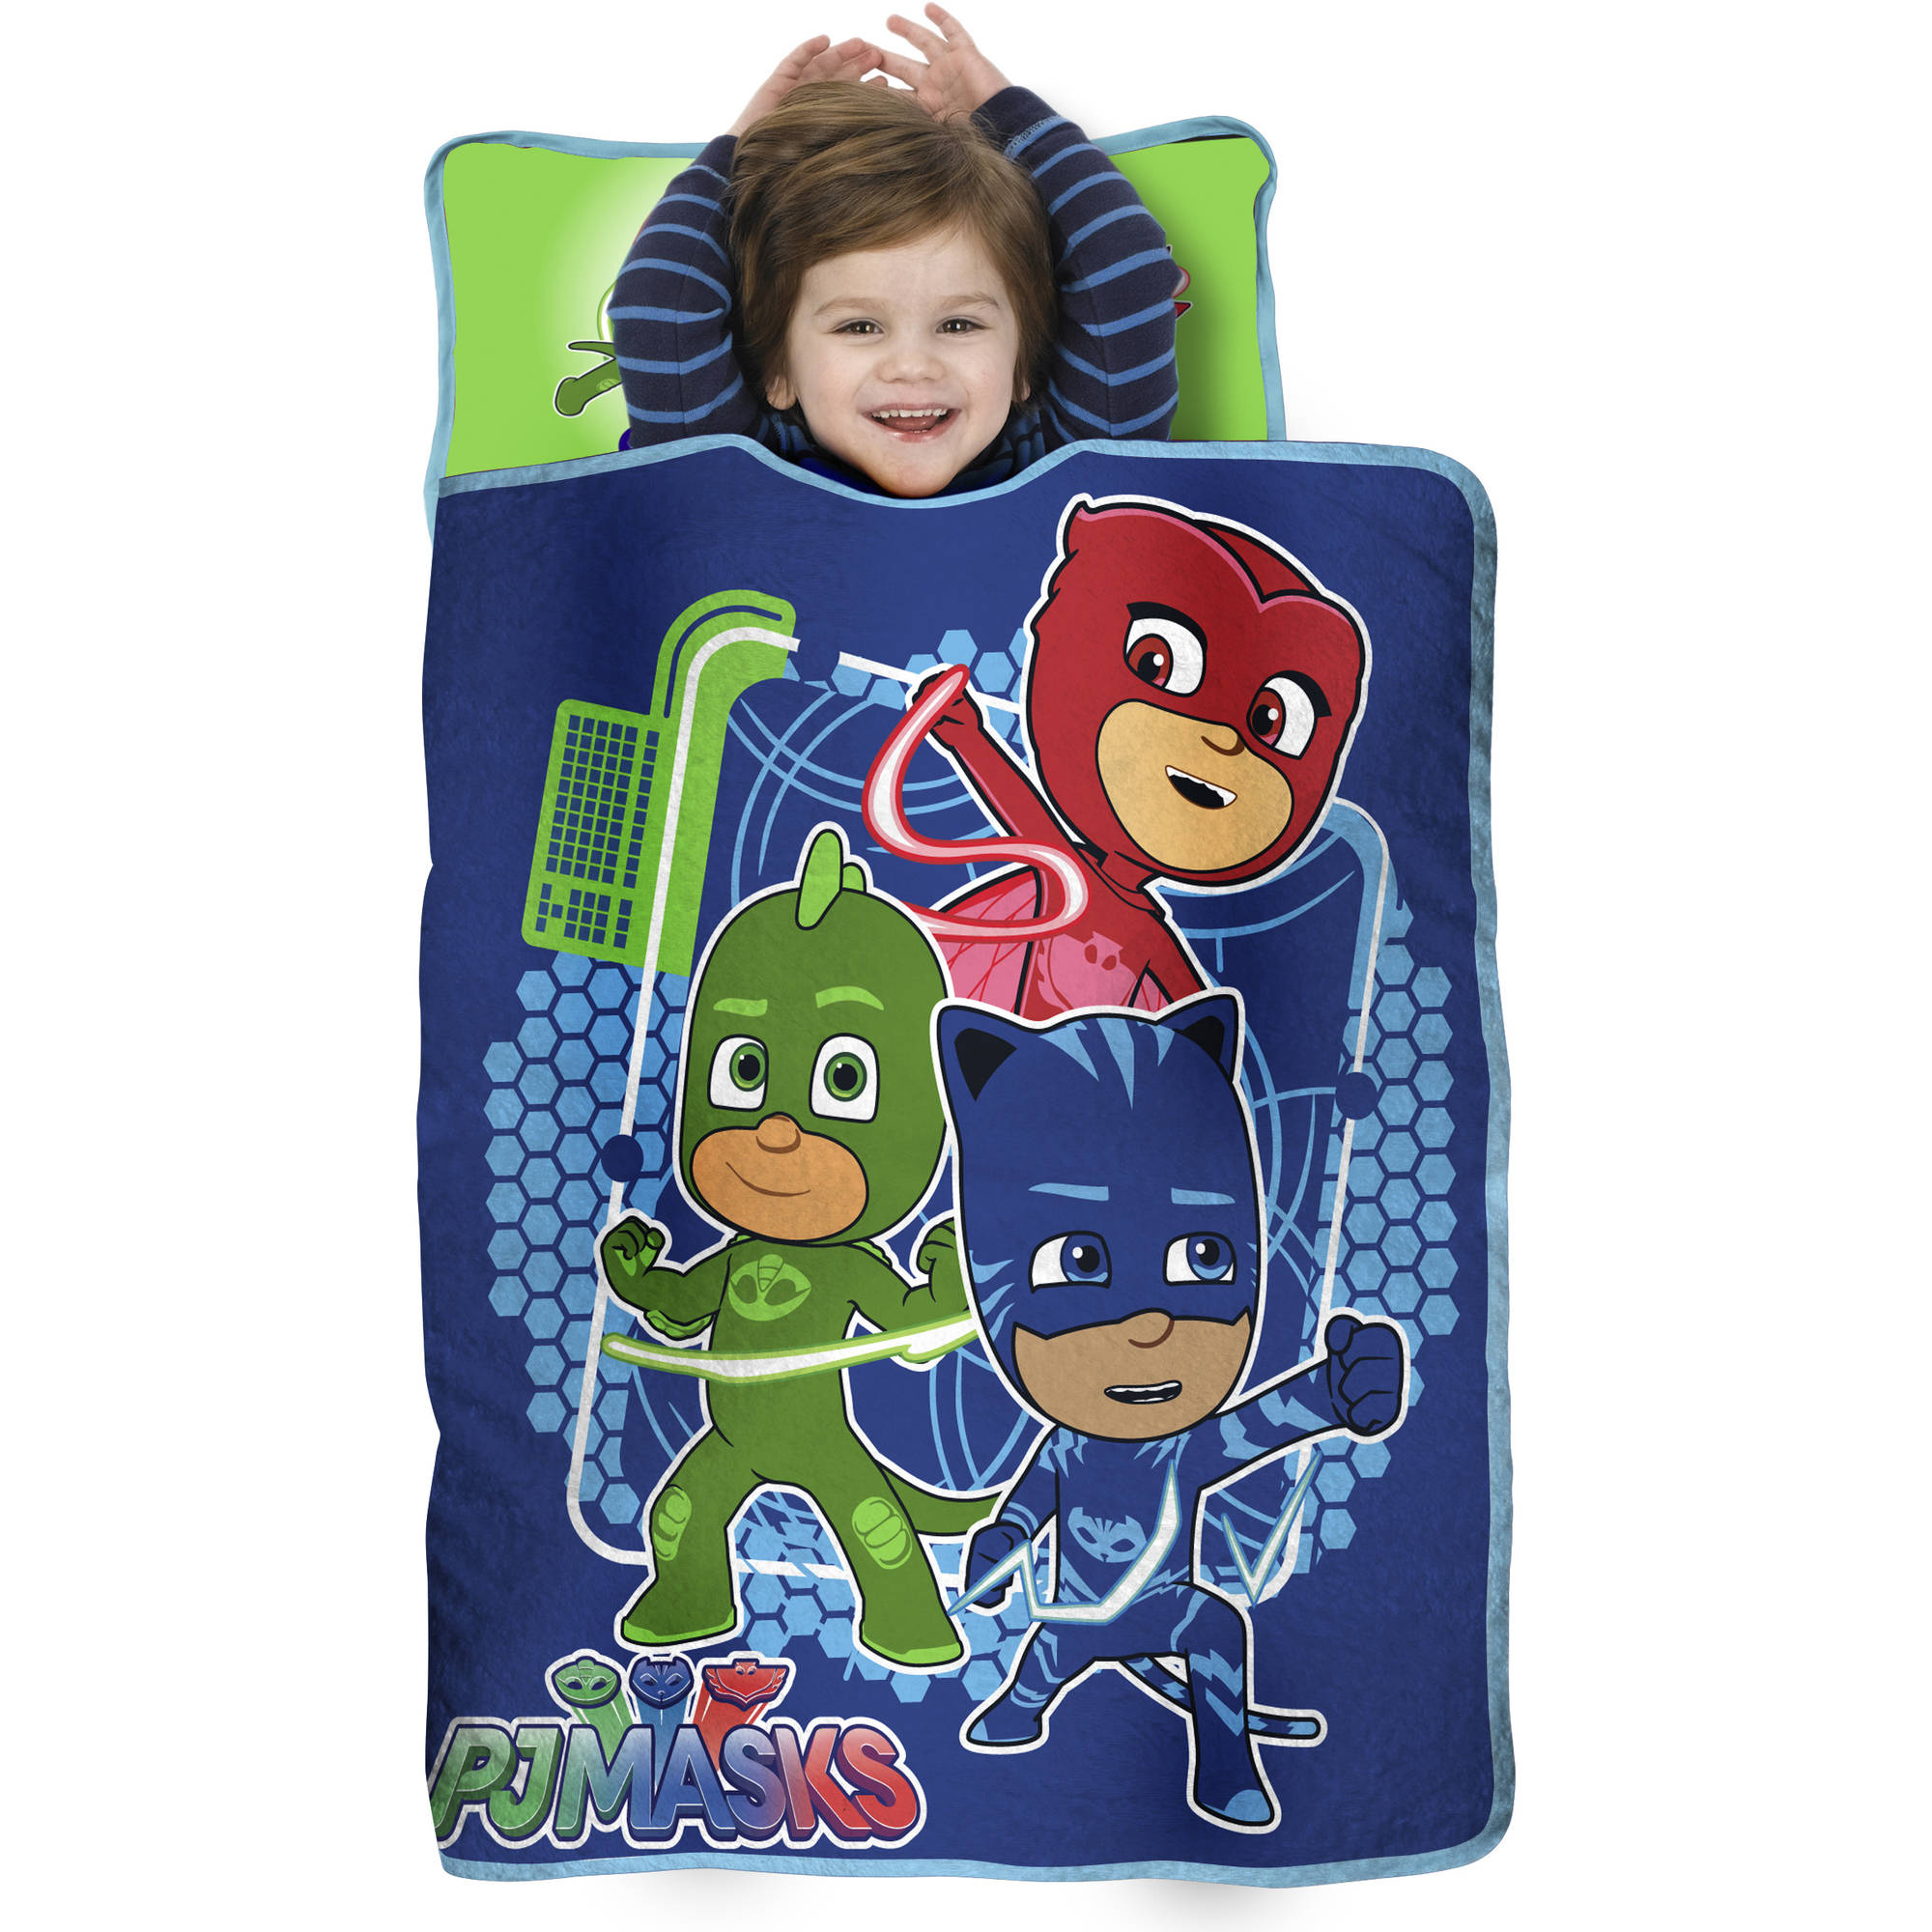 Kindermat 174 Children S Rest Mat Reversible Blue Green